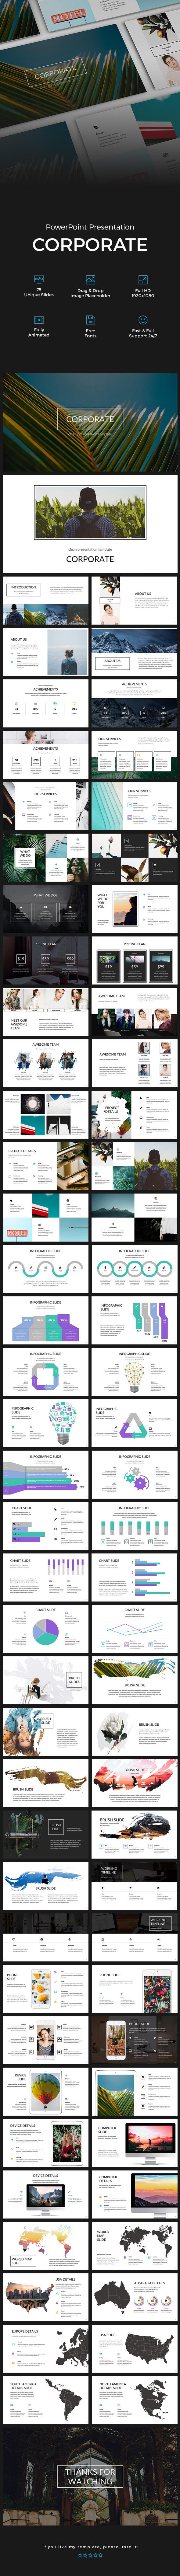 Corporate PowerPoint Presentation - PowerPoint Templates Presentation Templates